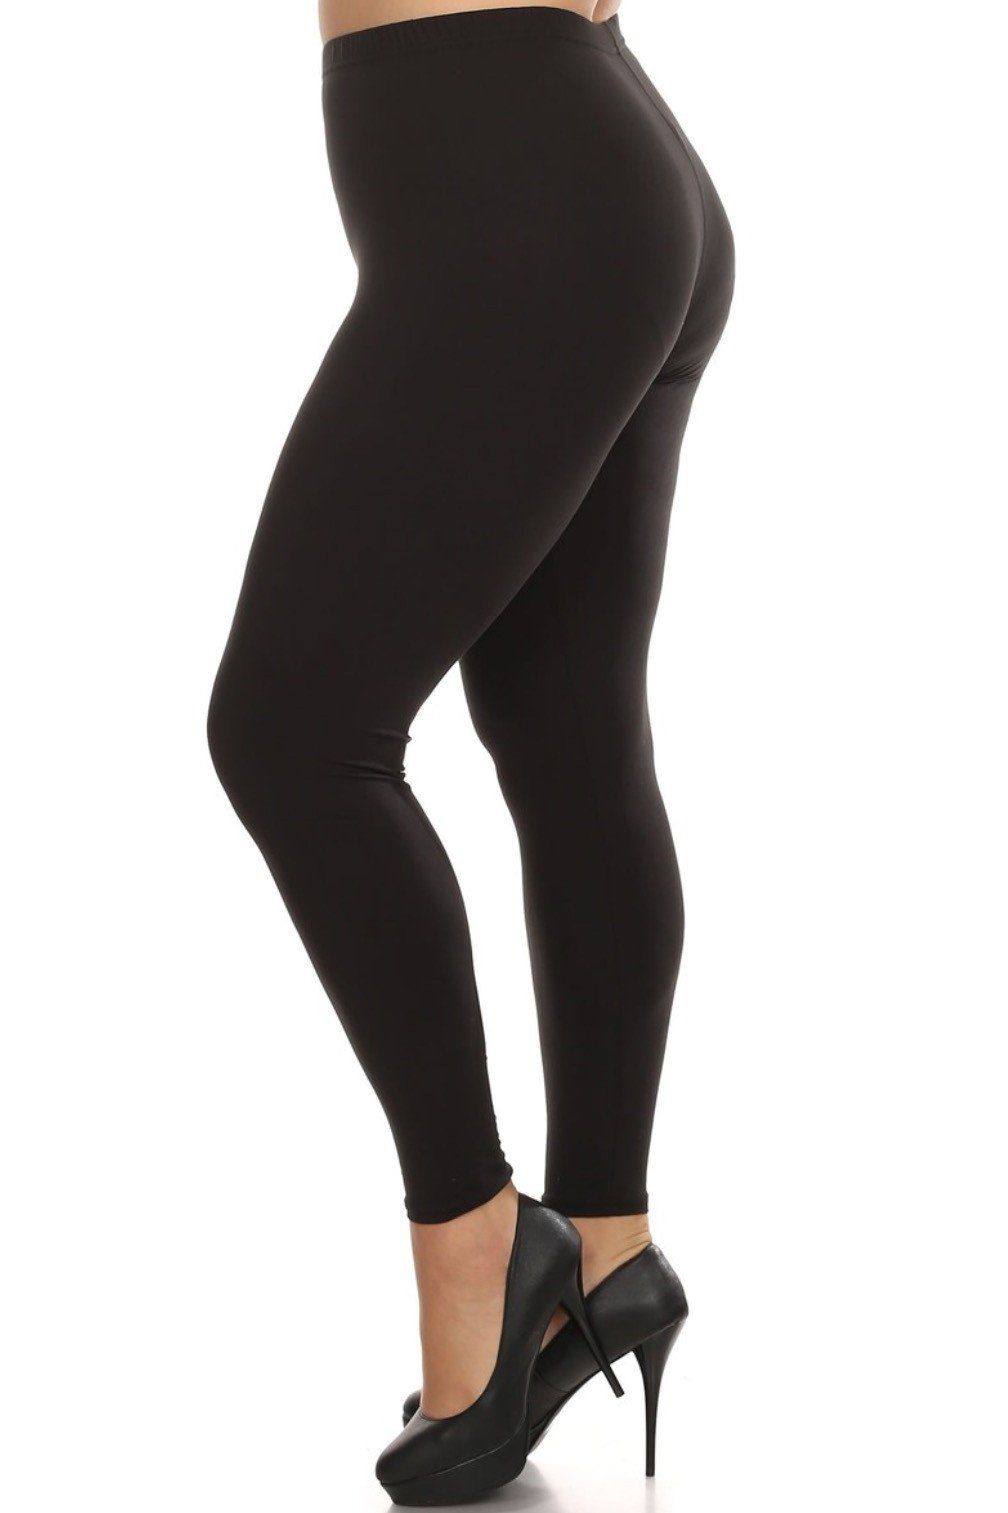 ***Super Soft*** Full Length Leggings- One Size & Curvy